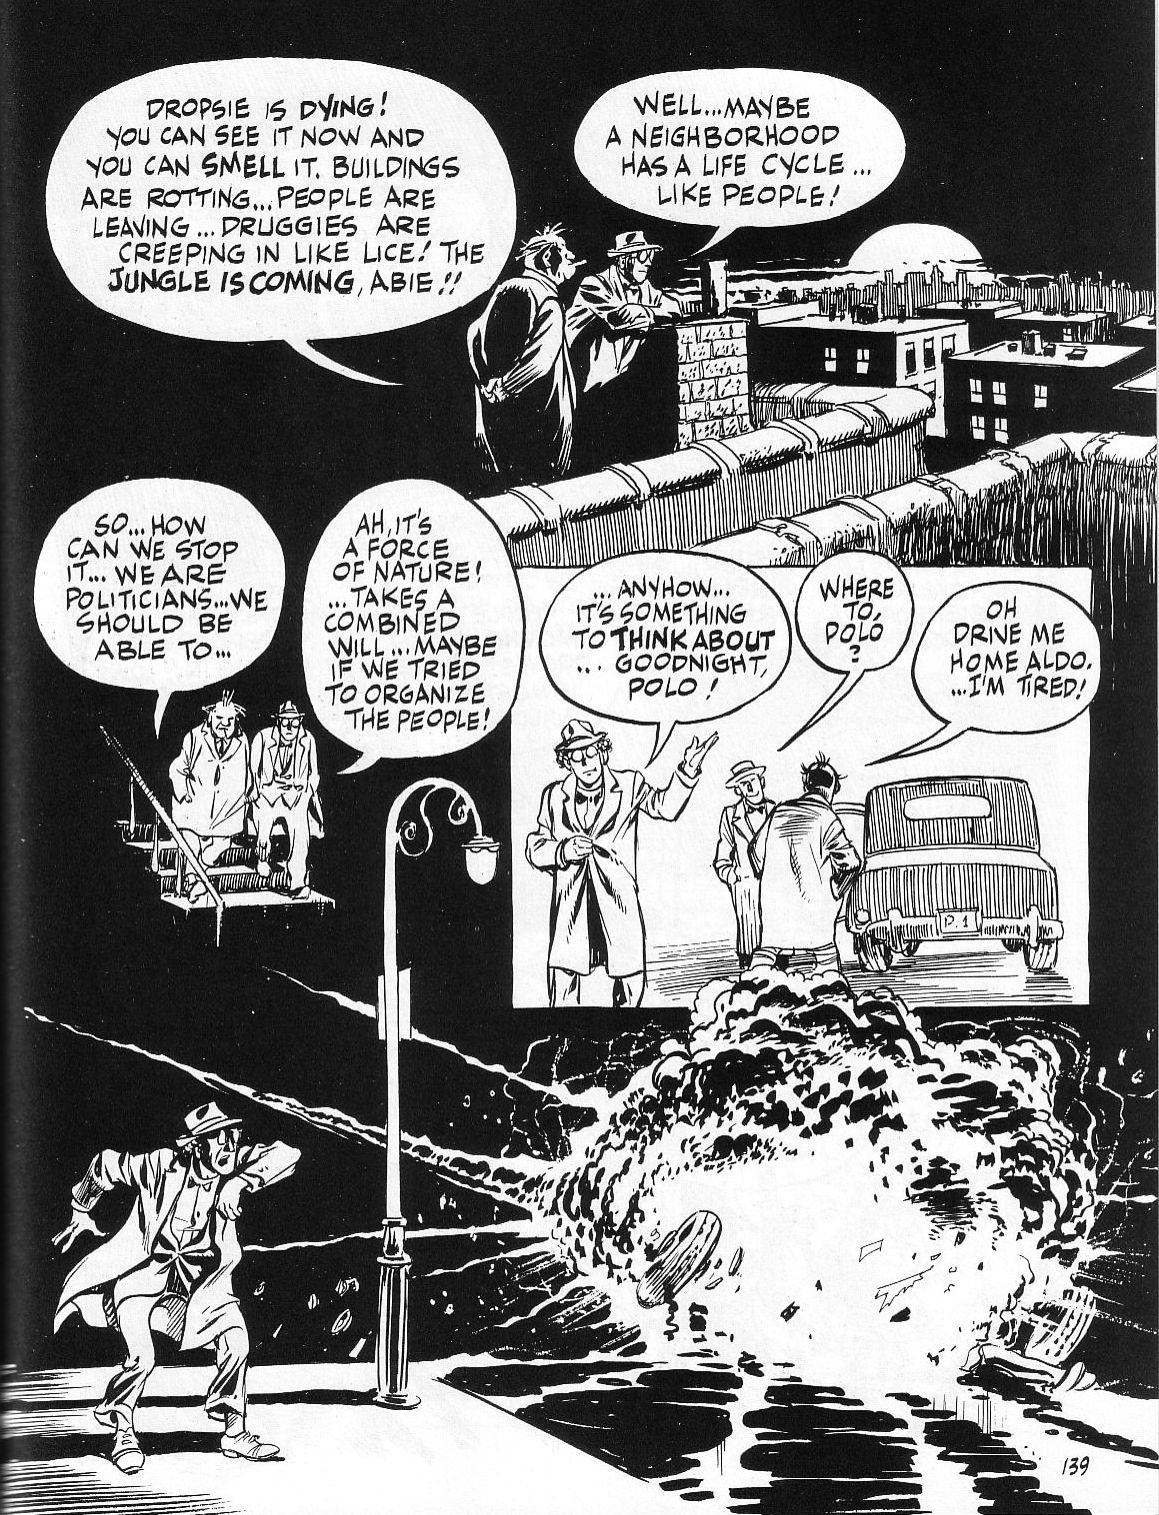 Read online Dropsie Avenue, The Neighborhood comic -  Issue # Full - 141